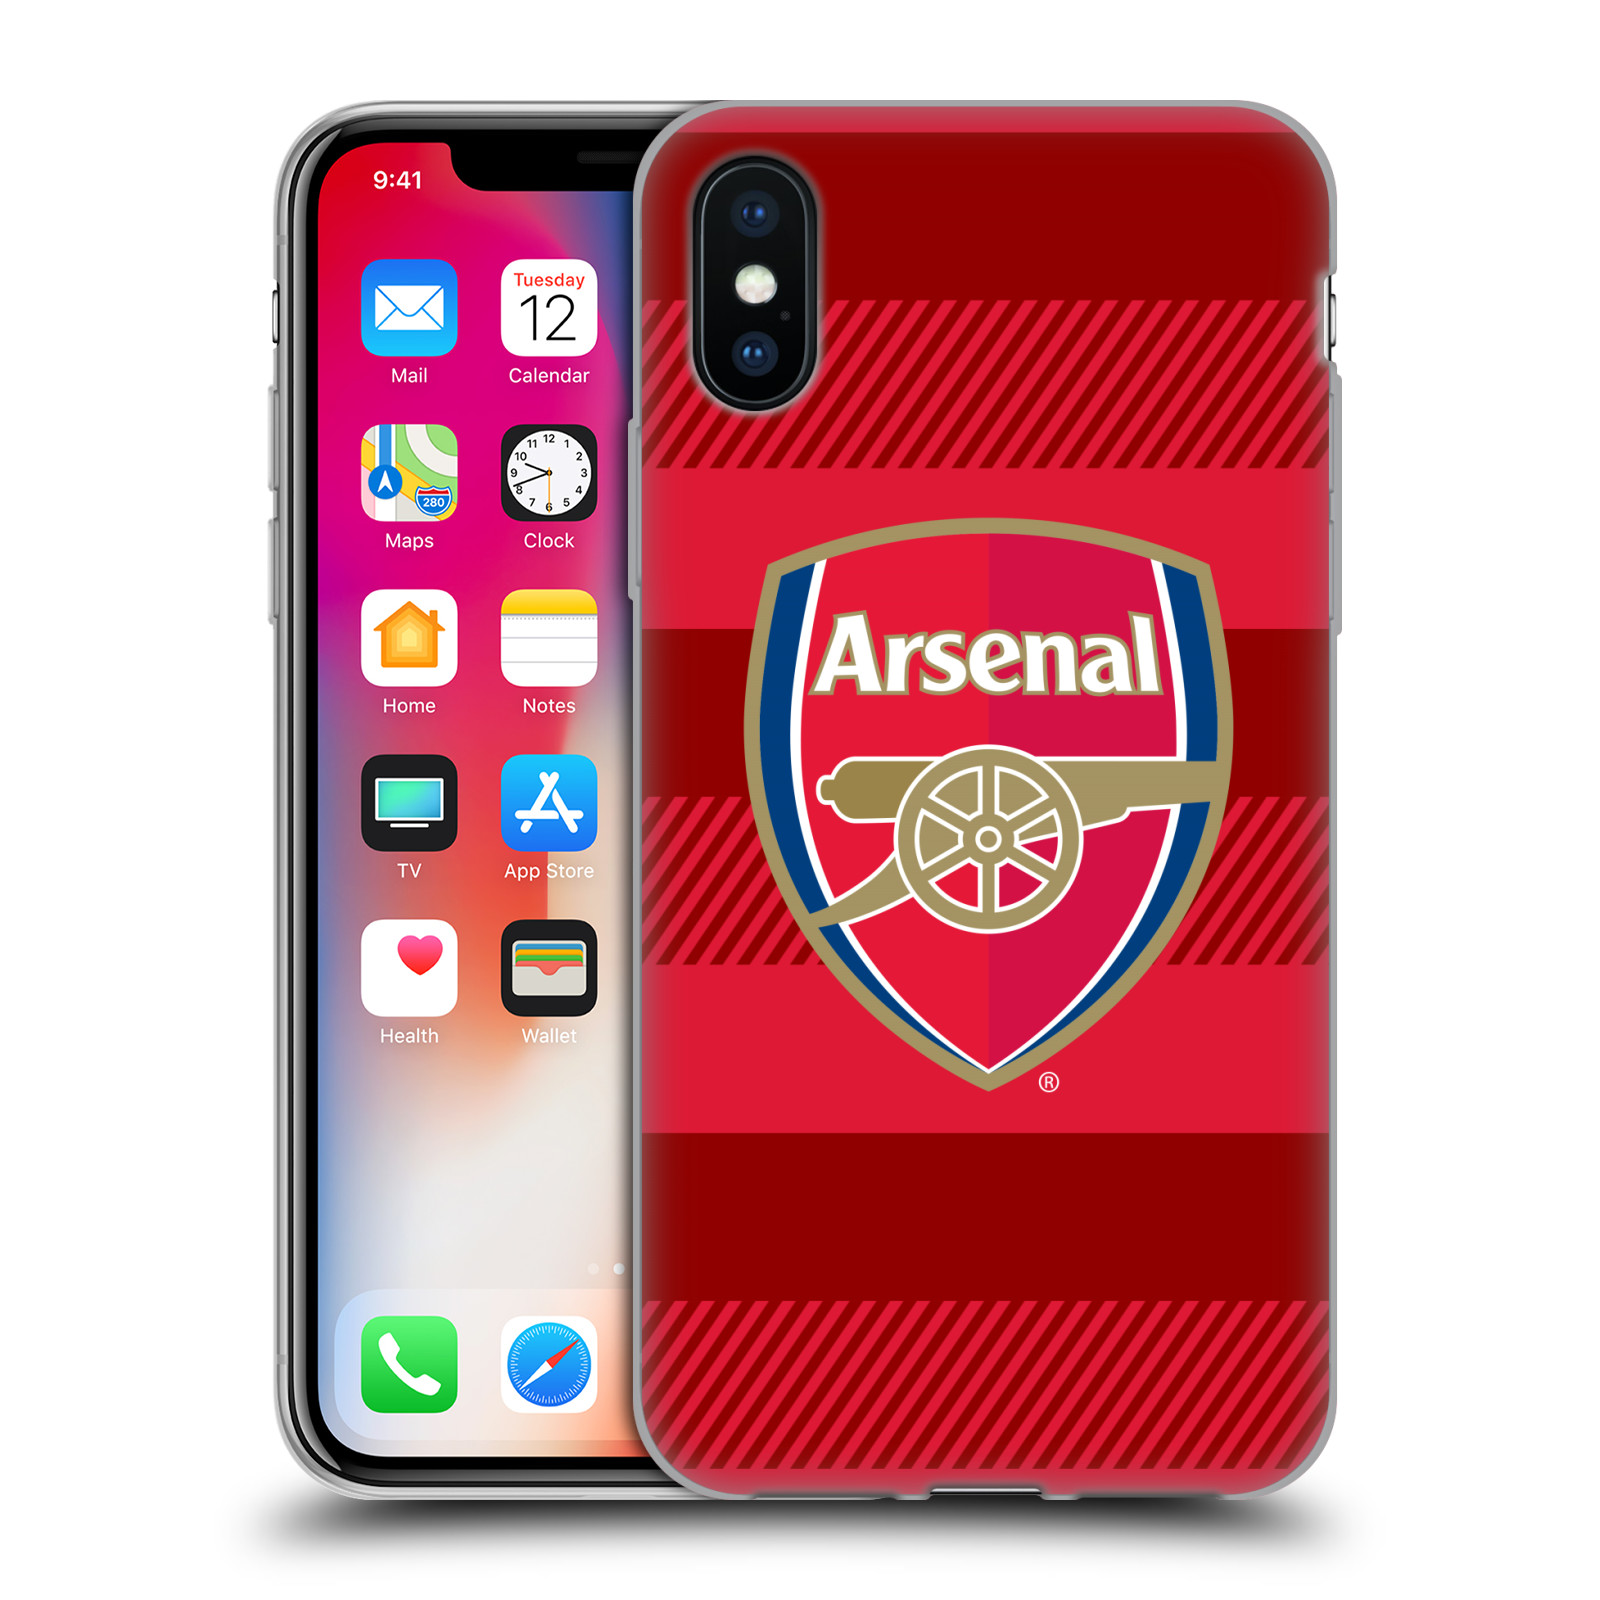 Silikonové pouzdro na mobil Apple iPhone XS - Head Case - Arsenal FC - Logo s pruhy